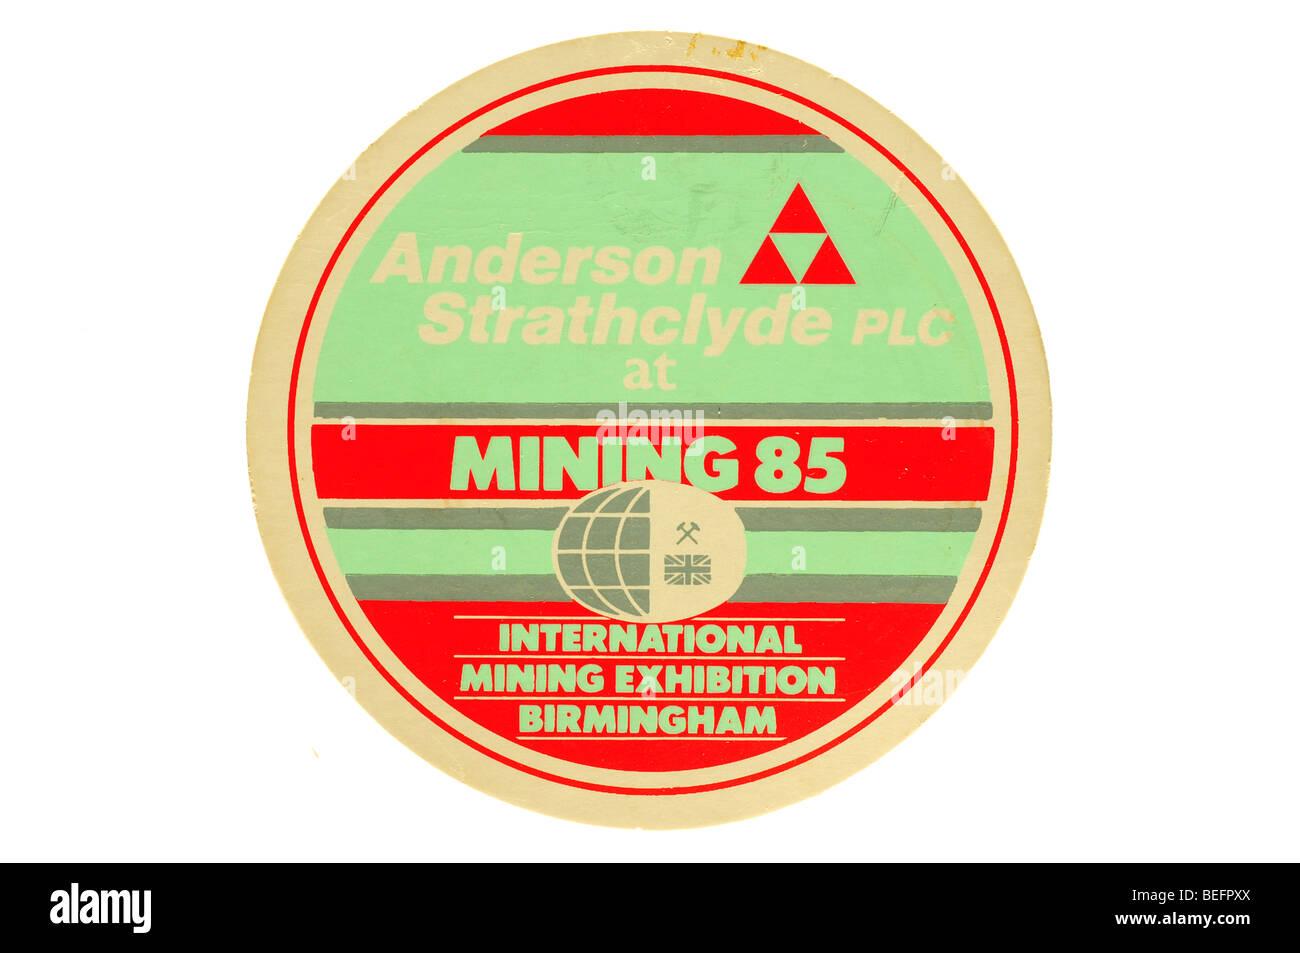 anderson strathclyde plc at minig 85 international mining exhibition birmingham - Stock Image